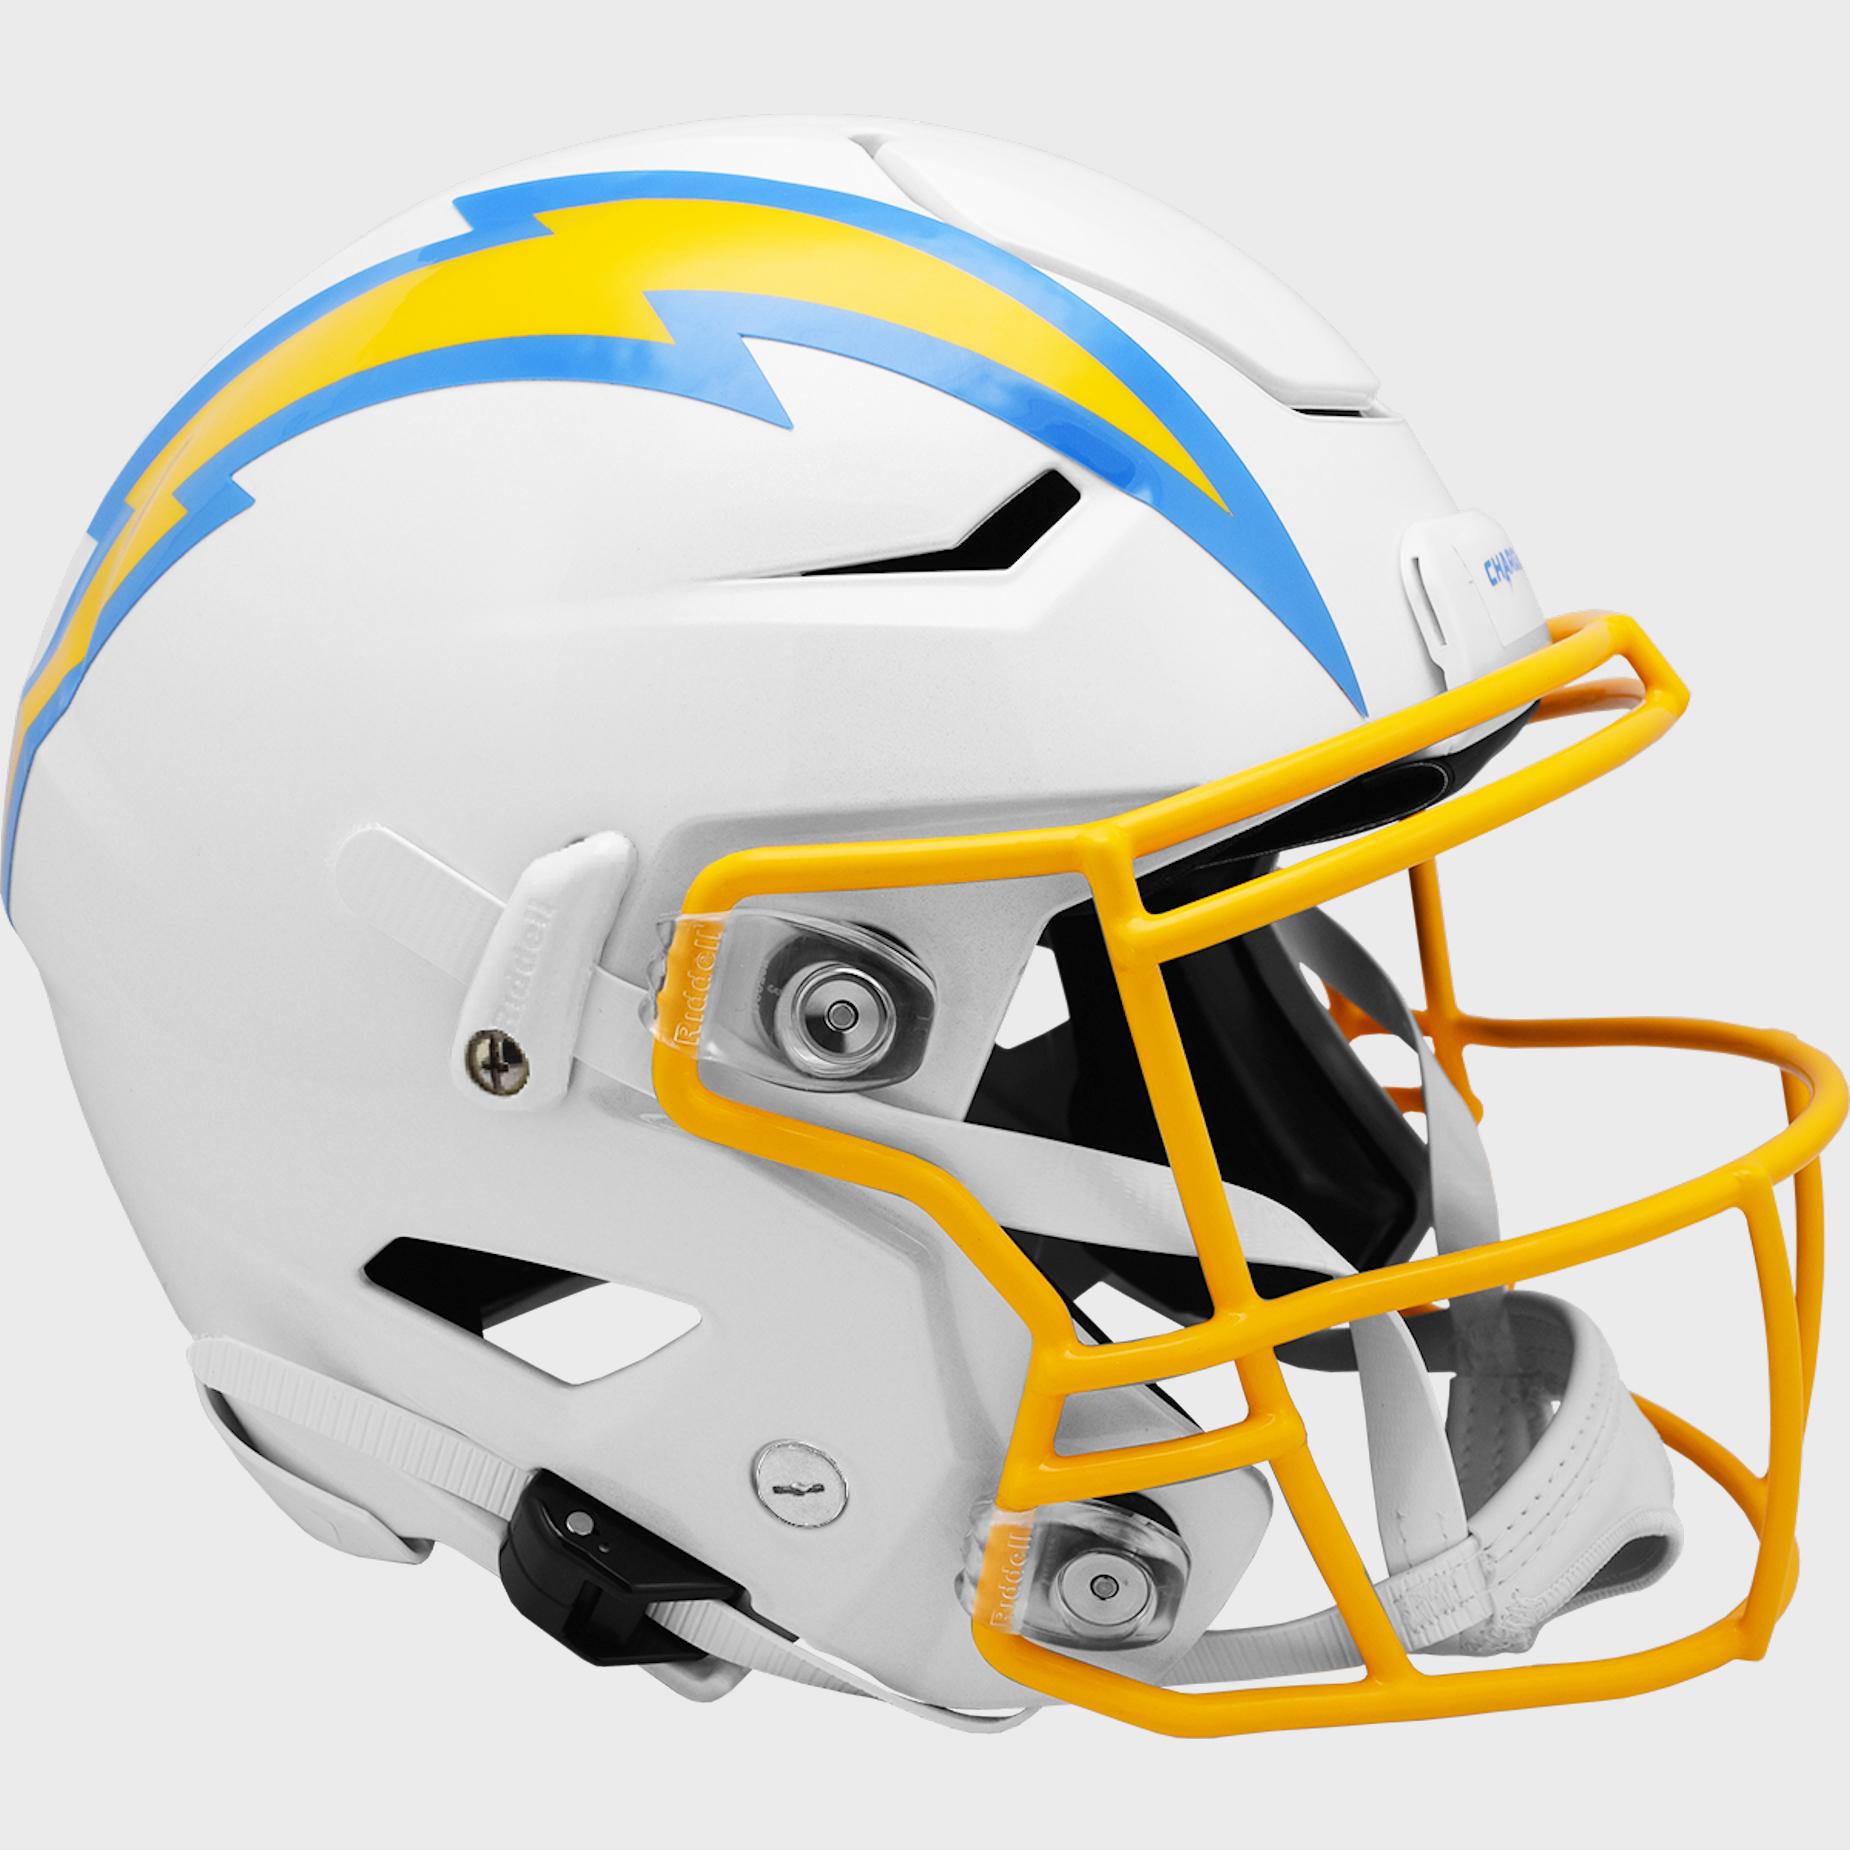 Los Angeles Chargers SpeedFlex Football Helmet <B>NEW 2020</B>